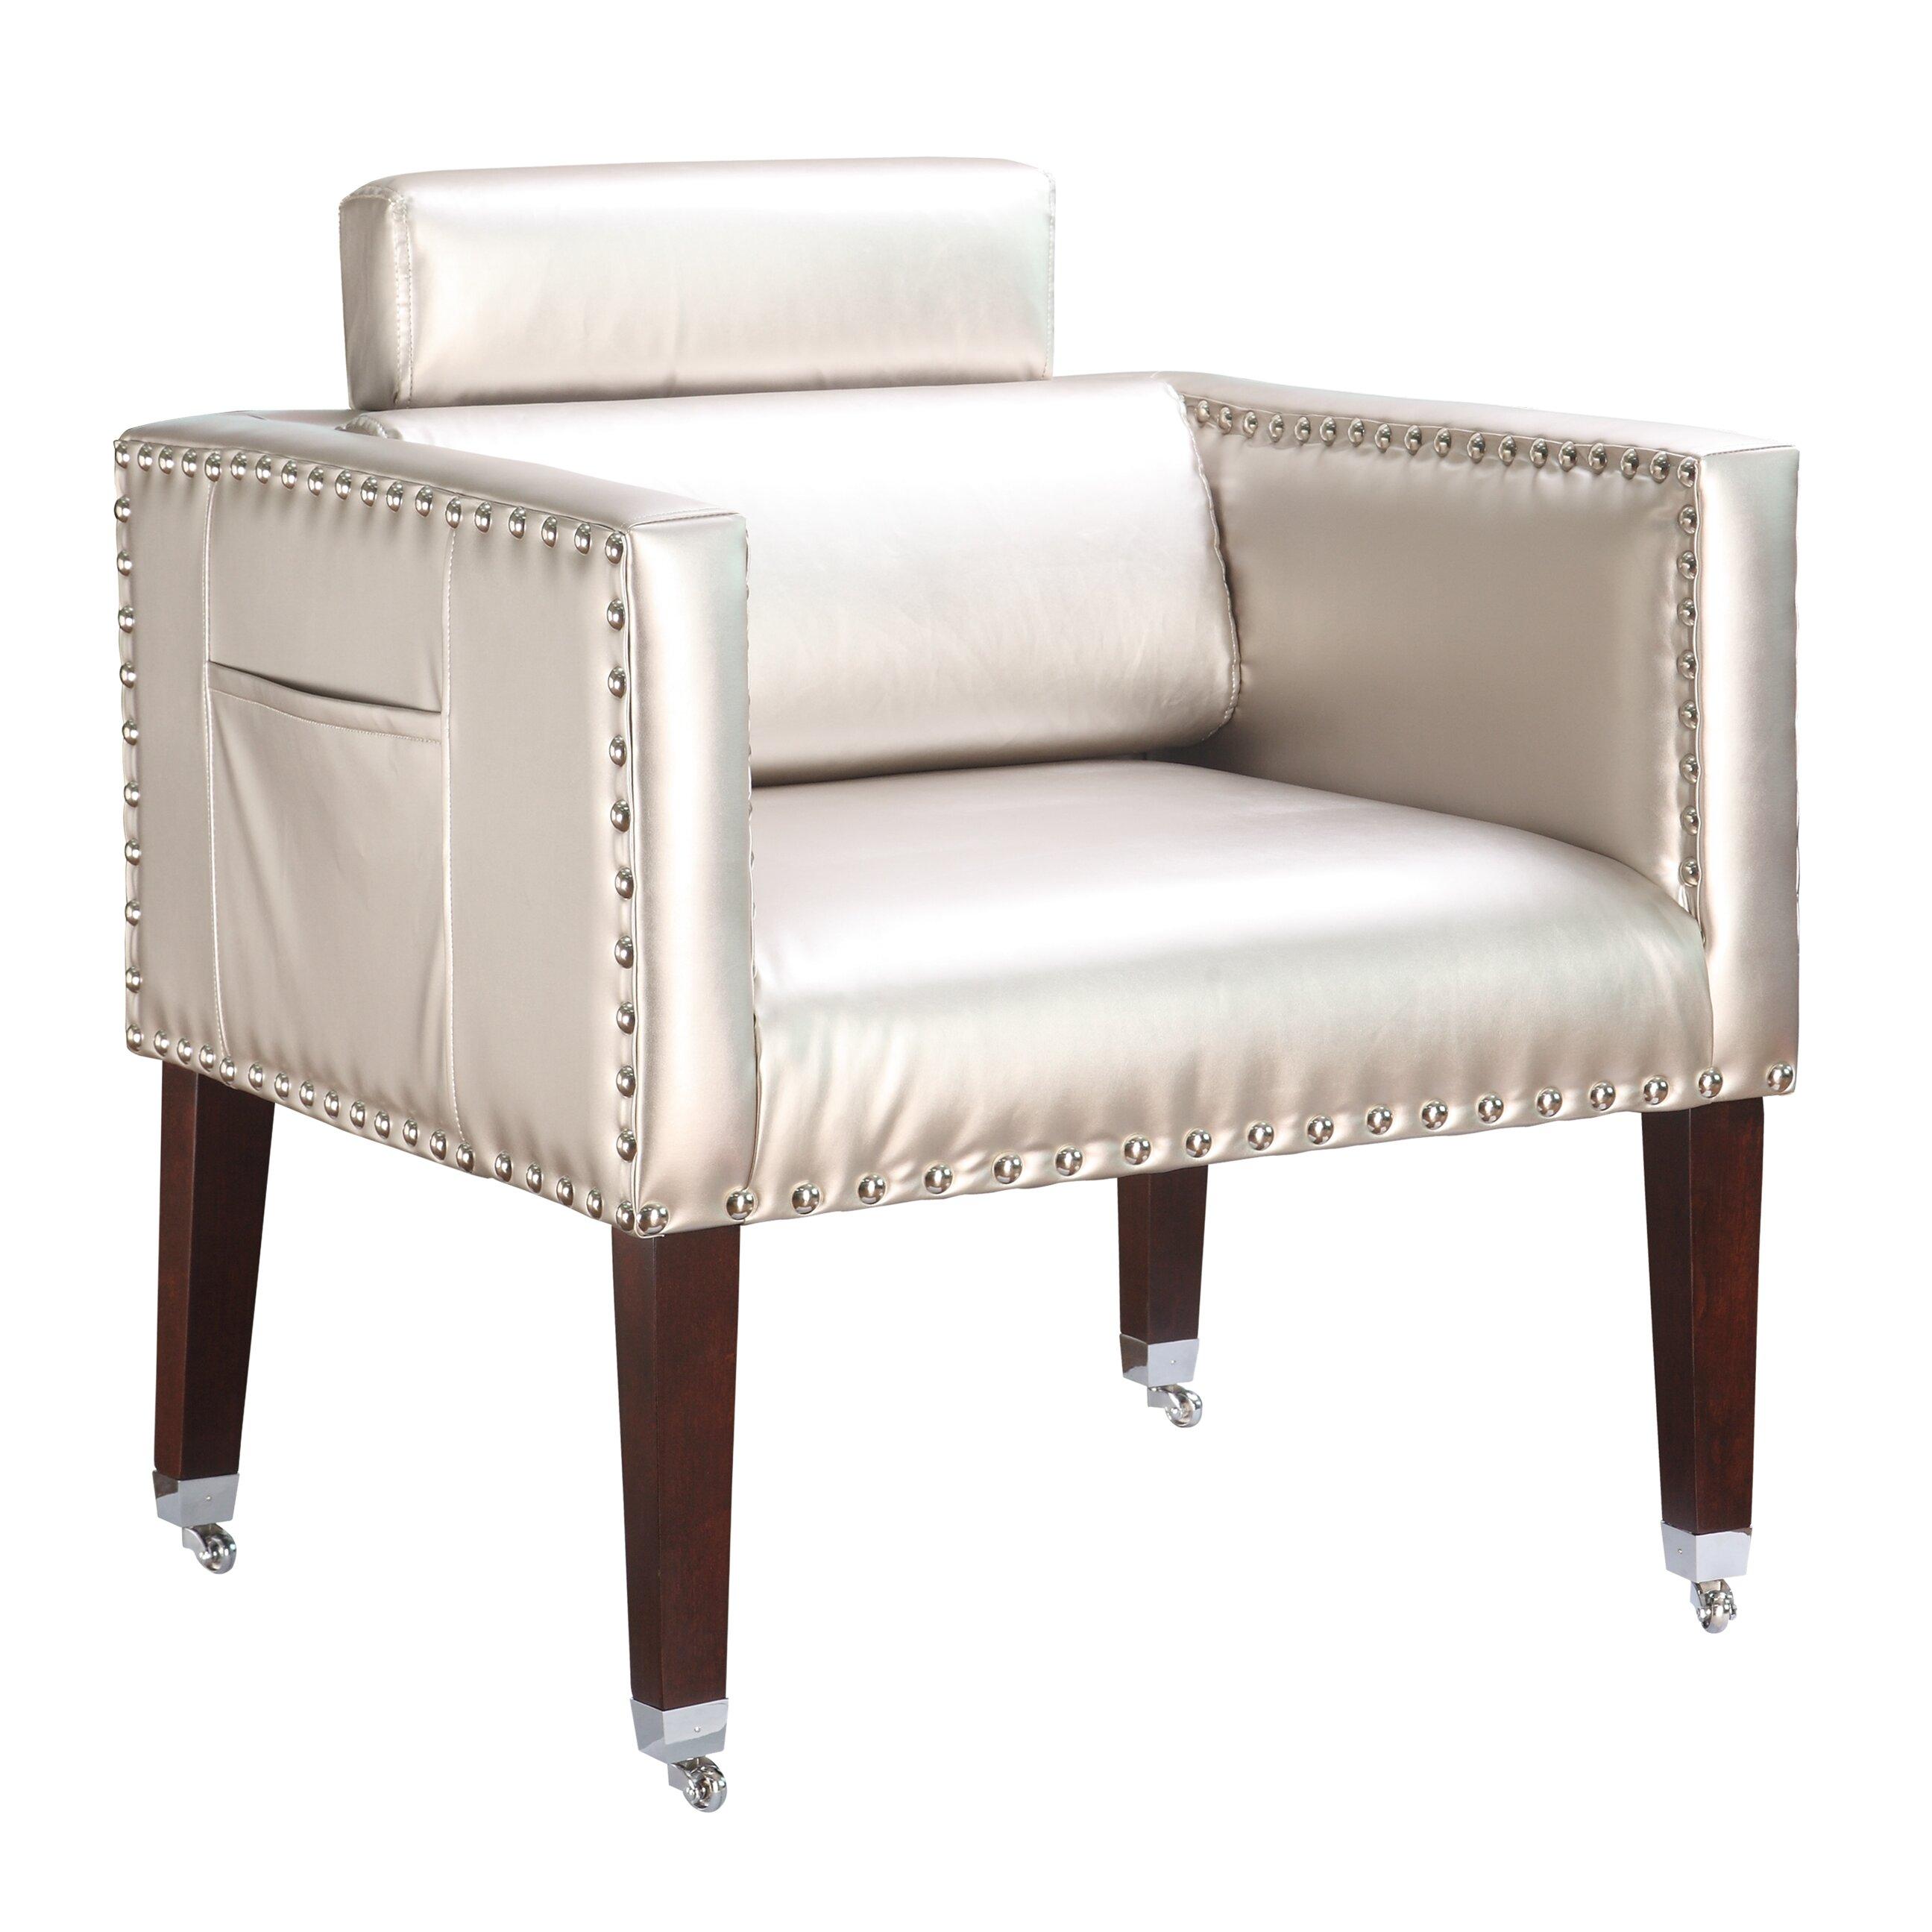 Silver Metallic Vinyl Accent Chair: Winmark Silver Dentist Vinyl Lounge Chair